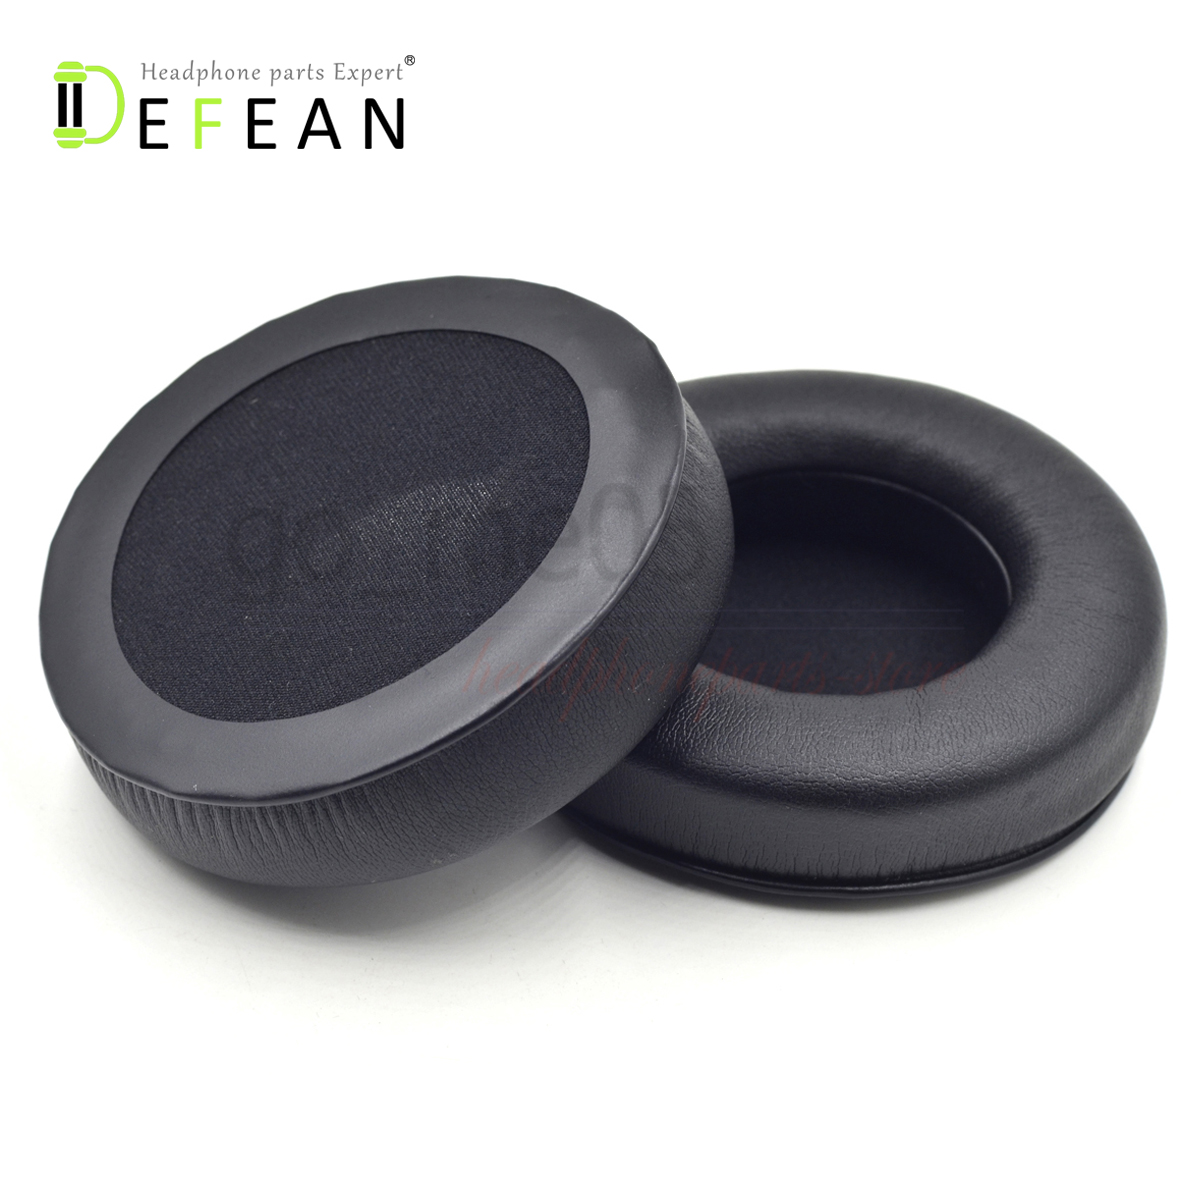 Replacement Pads Ear Pad Sponge Earpad Headphone Cover For razer kraken pro